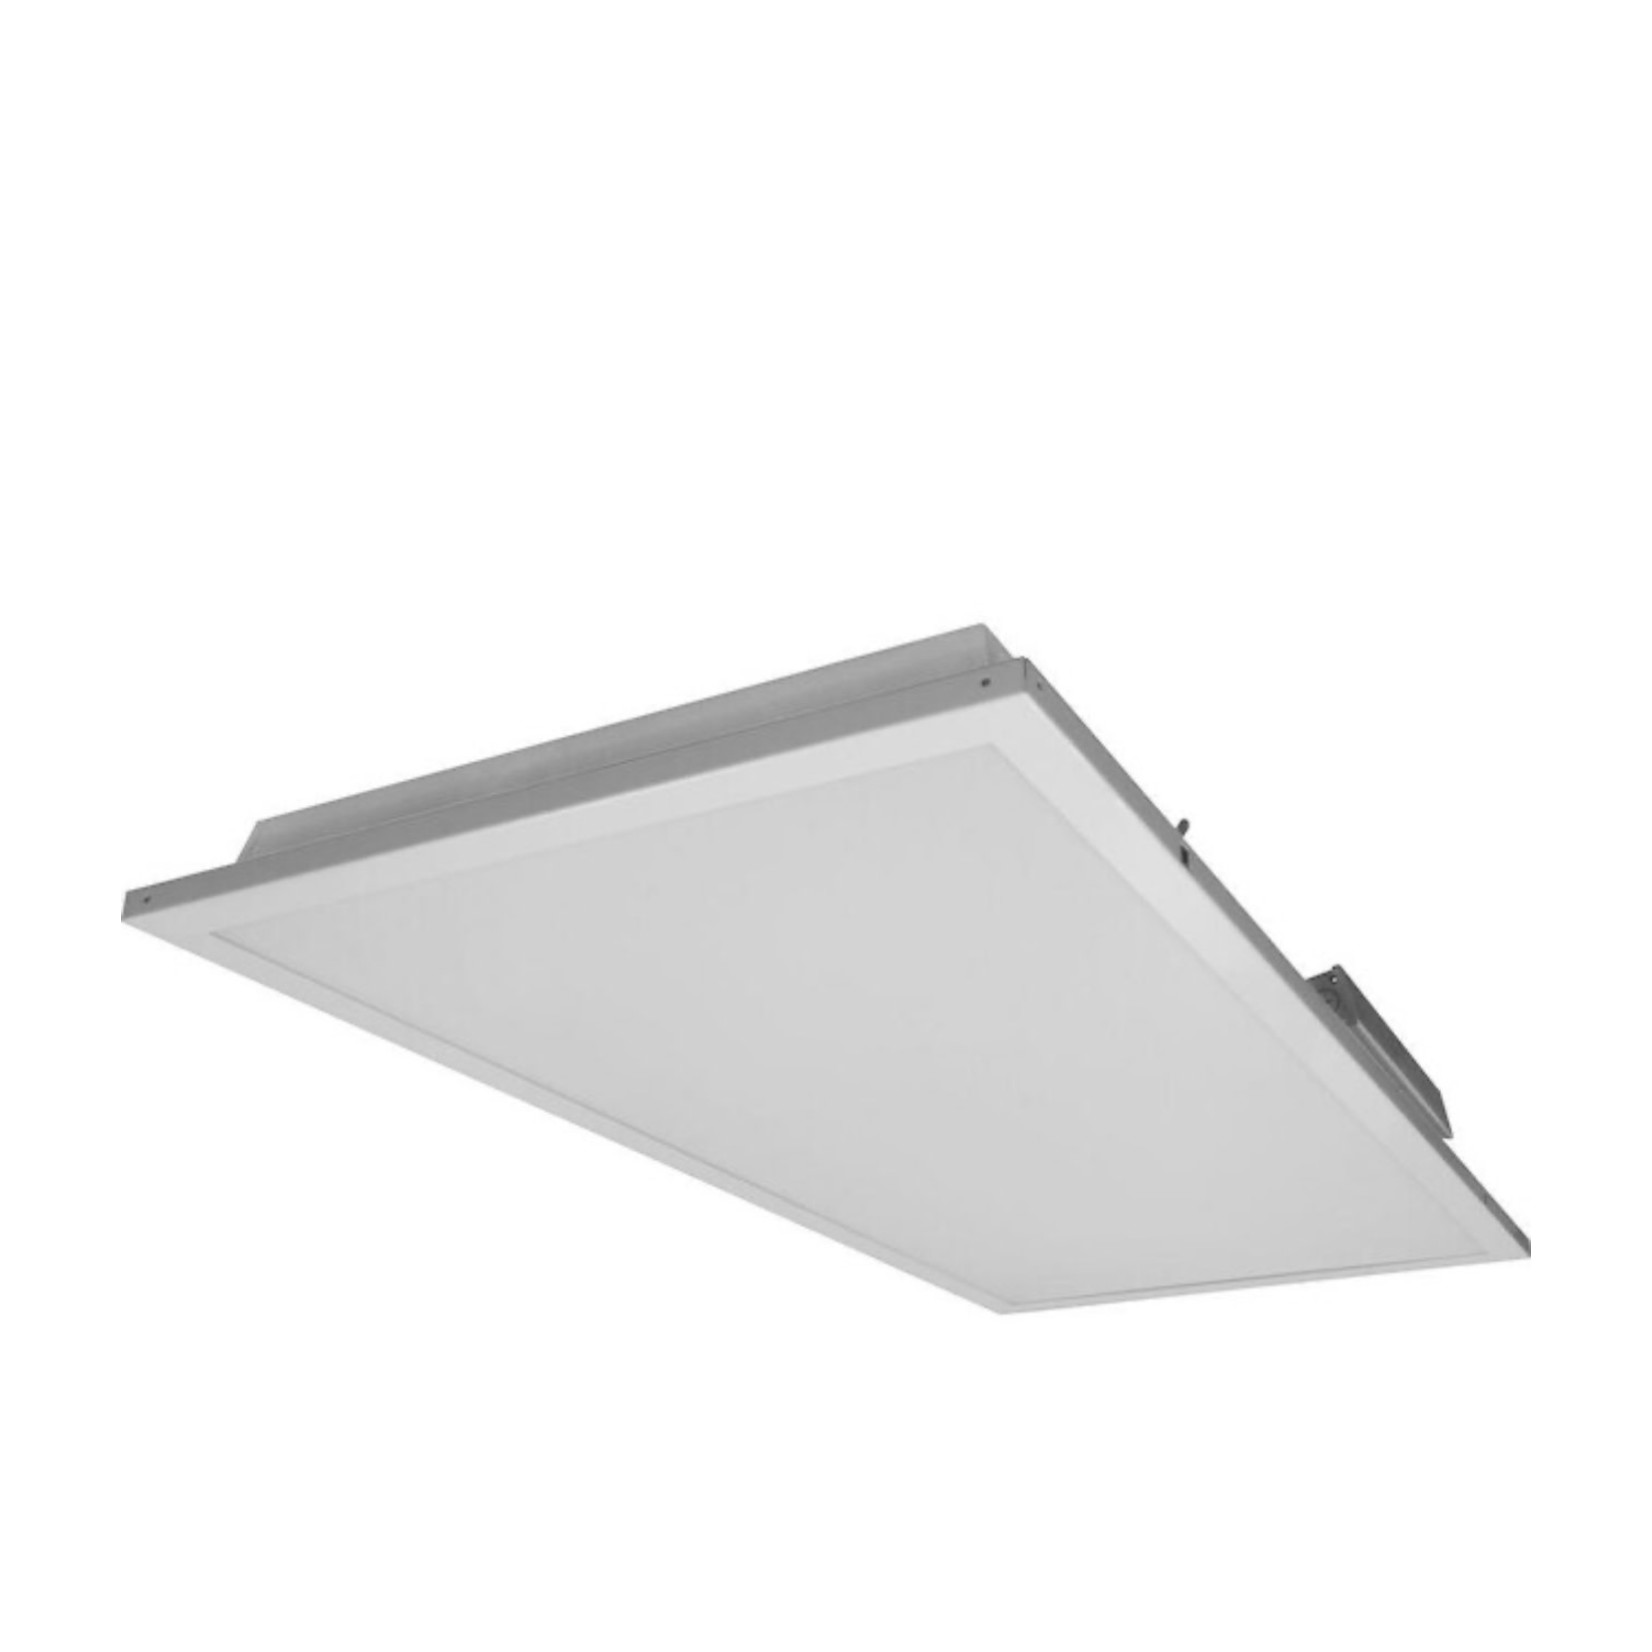 10508 New Nicor T3C 2x4 LED Ceiling Troffer LED Light